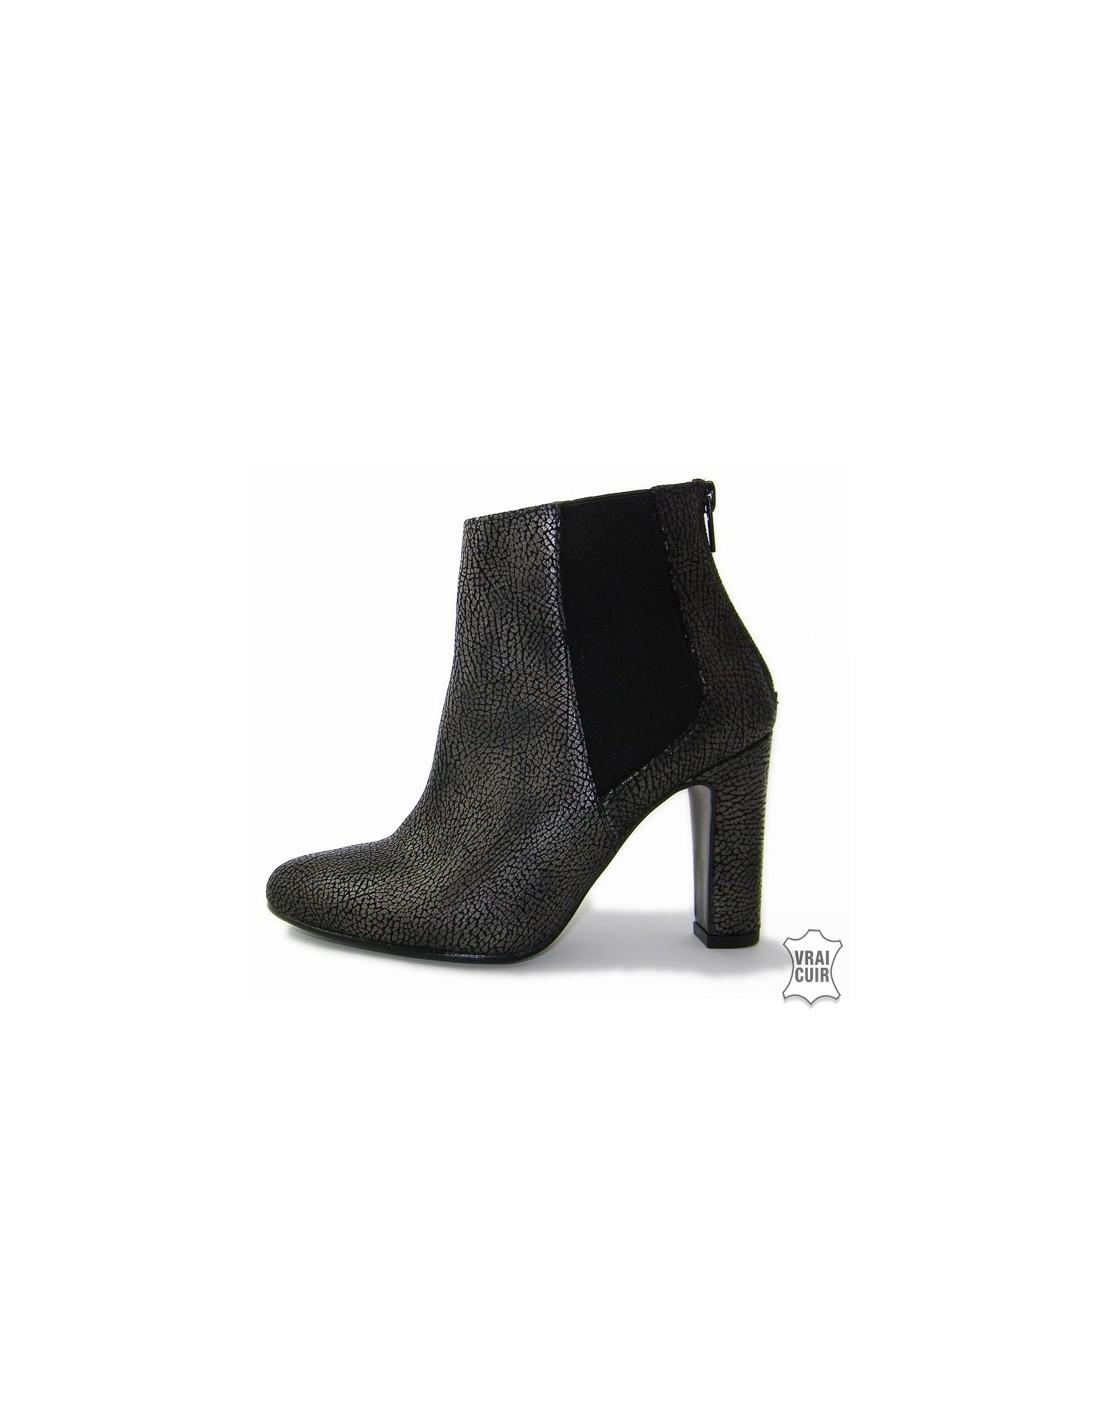 Chaussure Femme Petite Pointure 33 rCxstdhQ